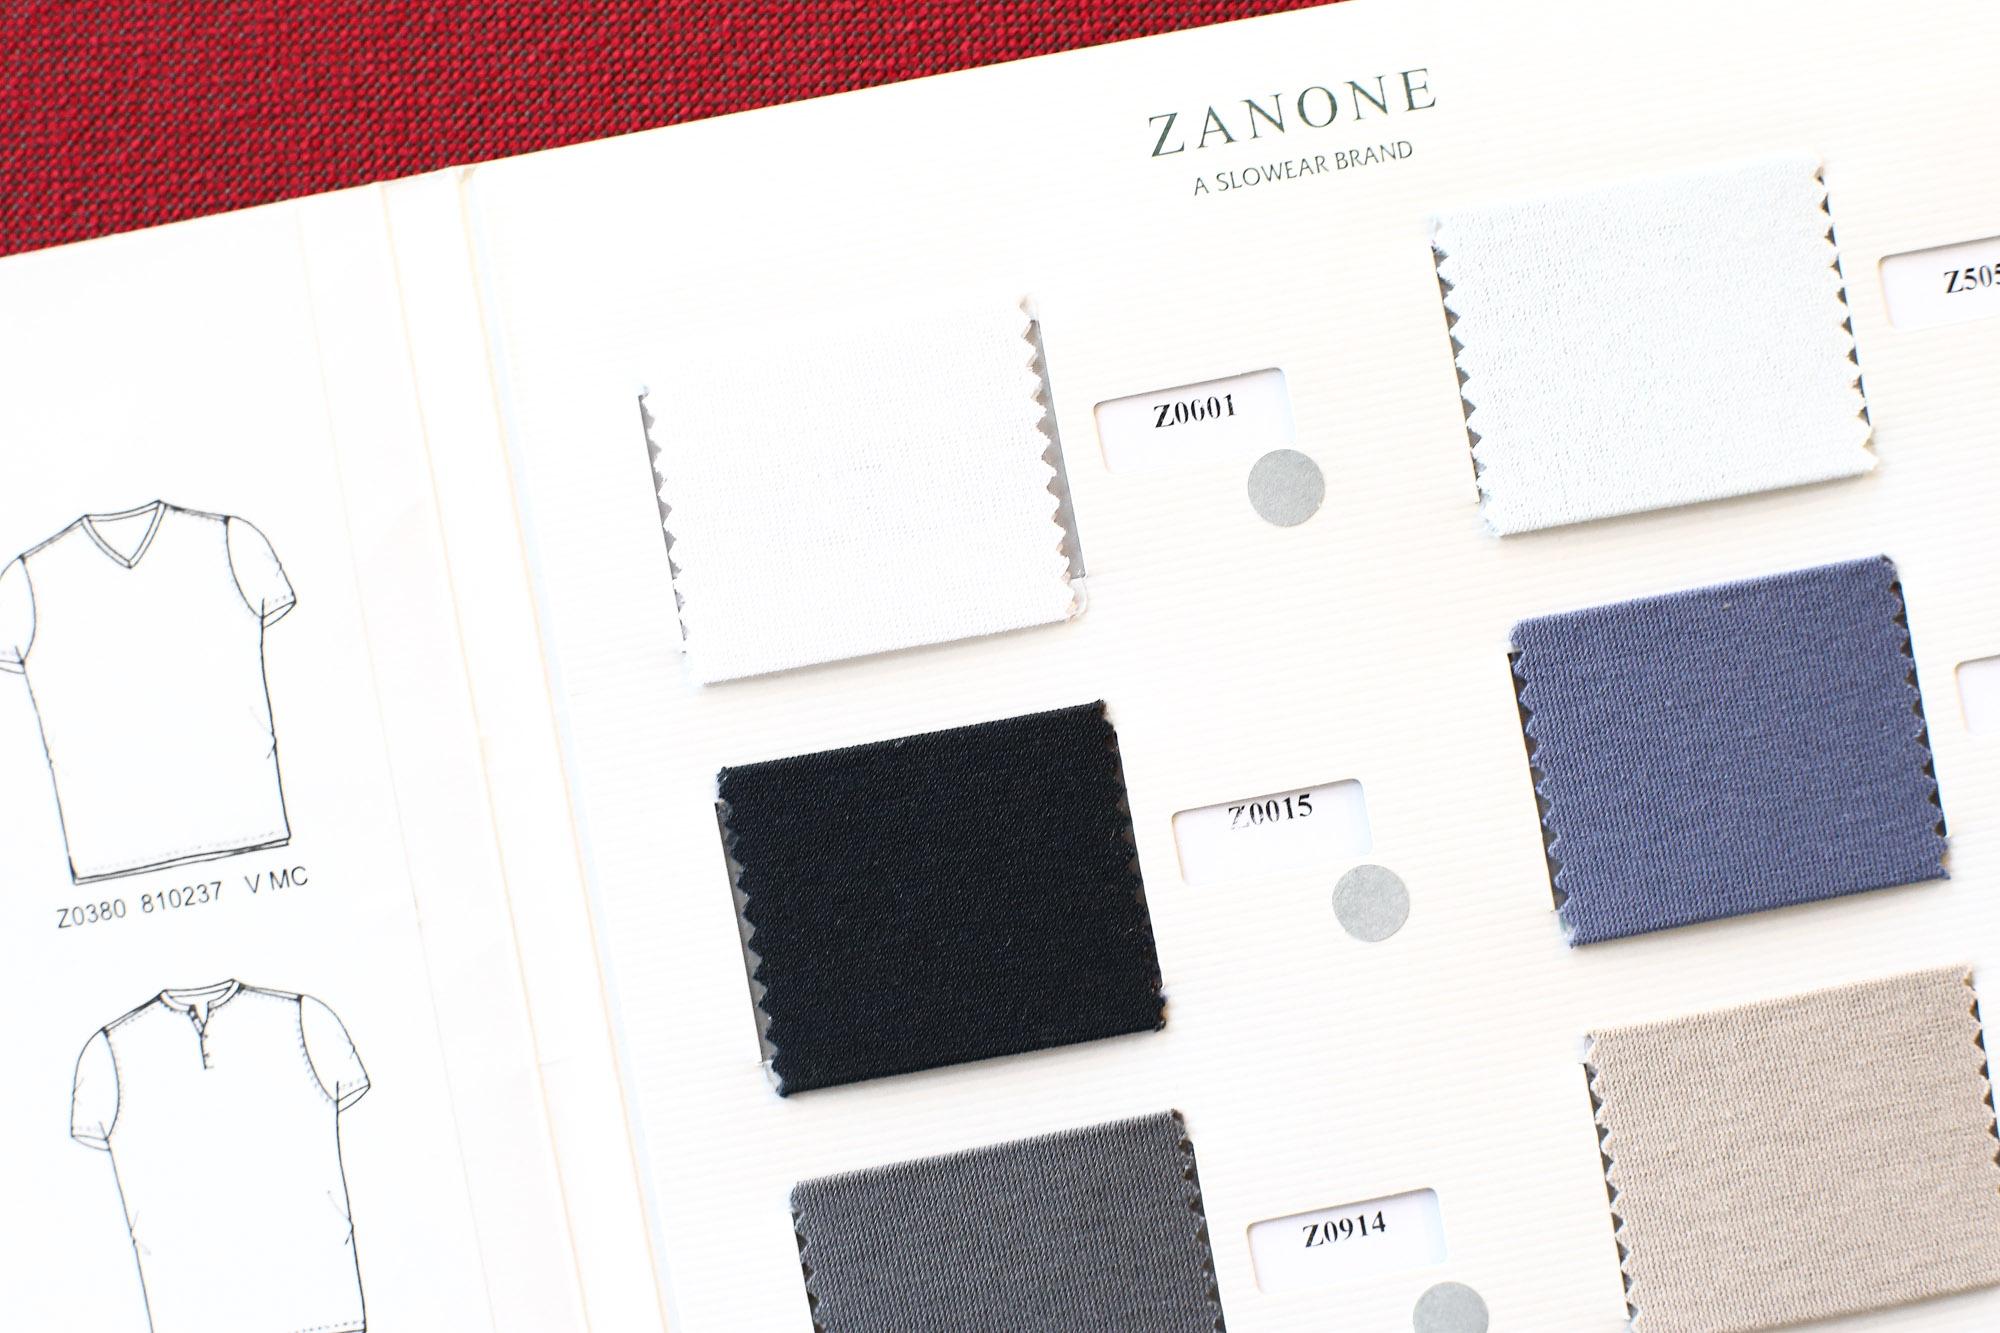 zanone-2017-summer-spring-exhibition1